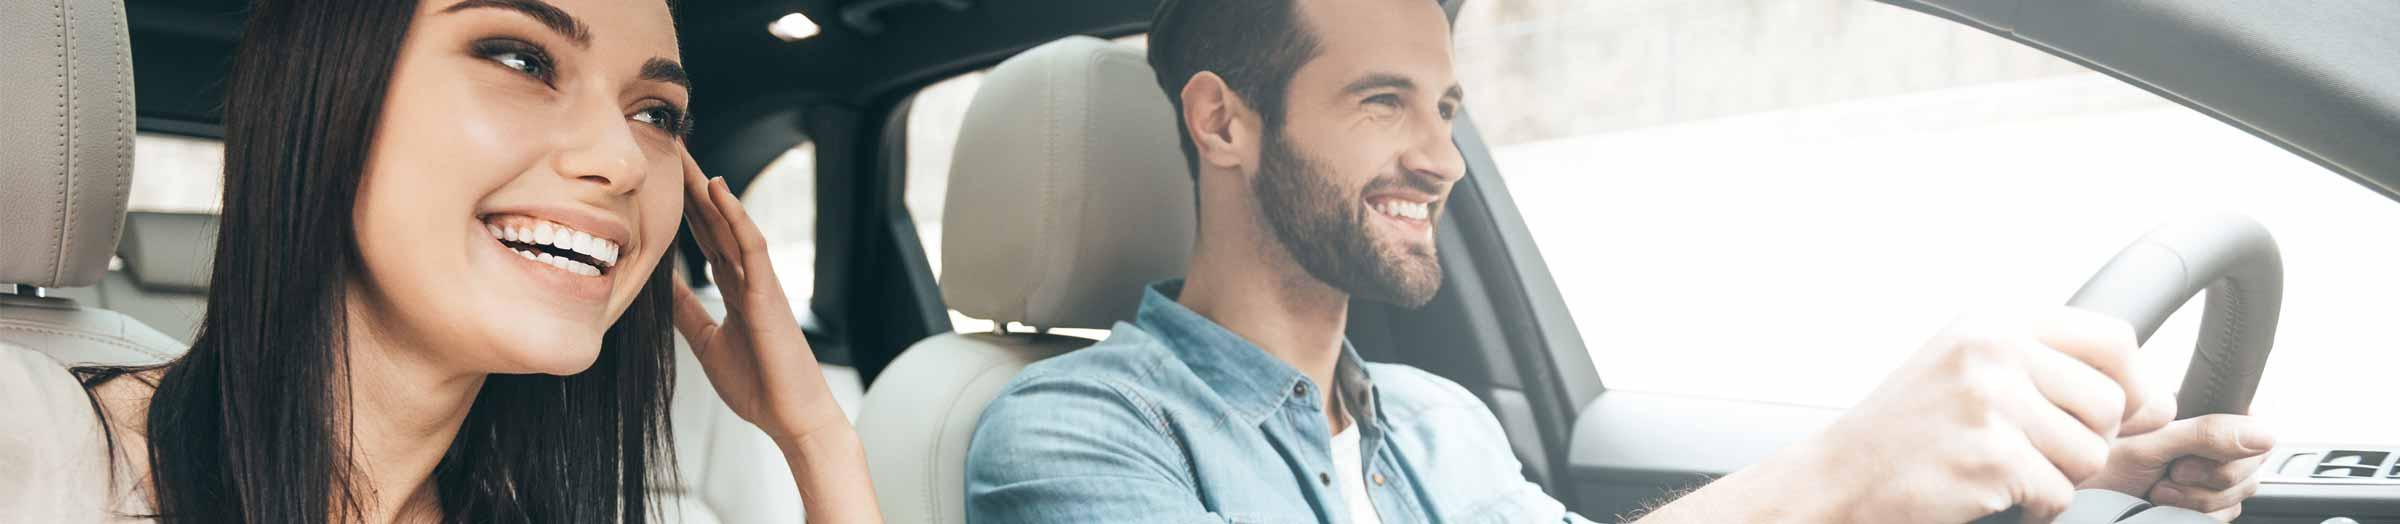 Insurance For Car Sharing And Lending